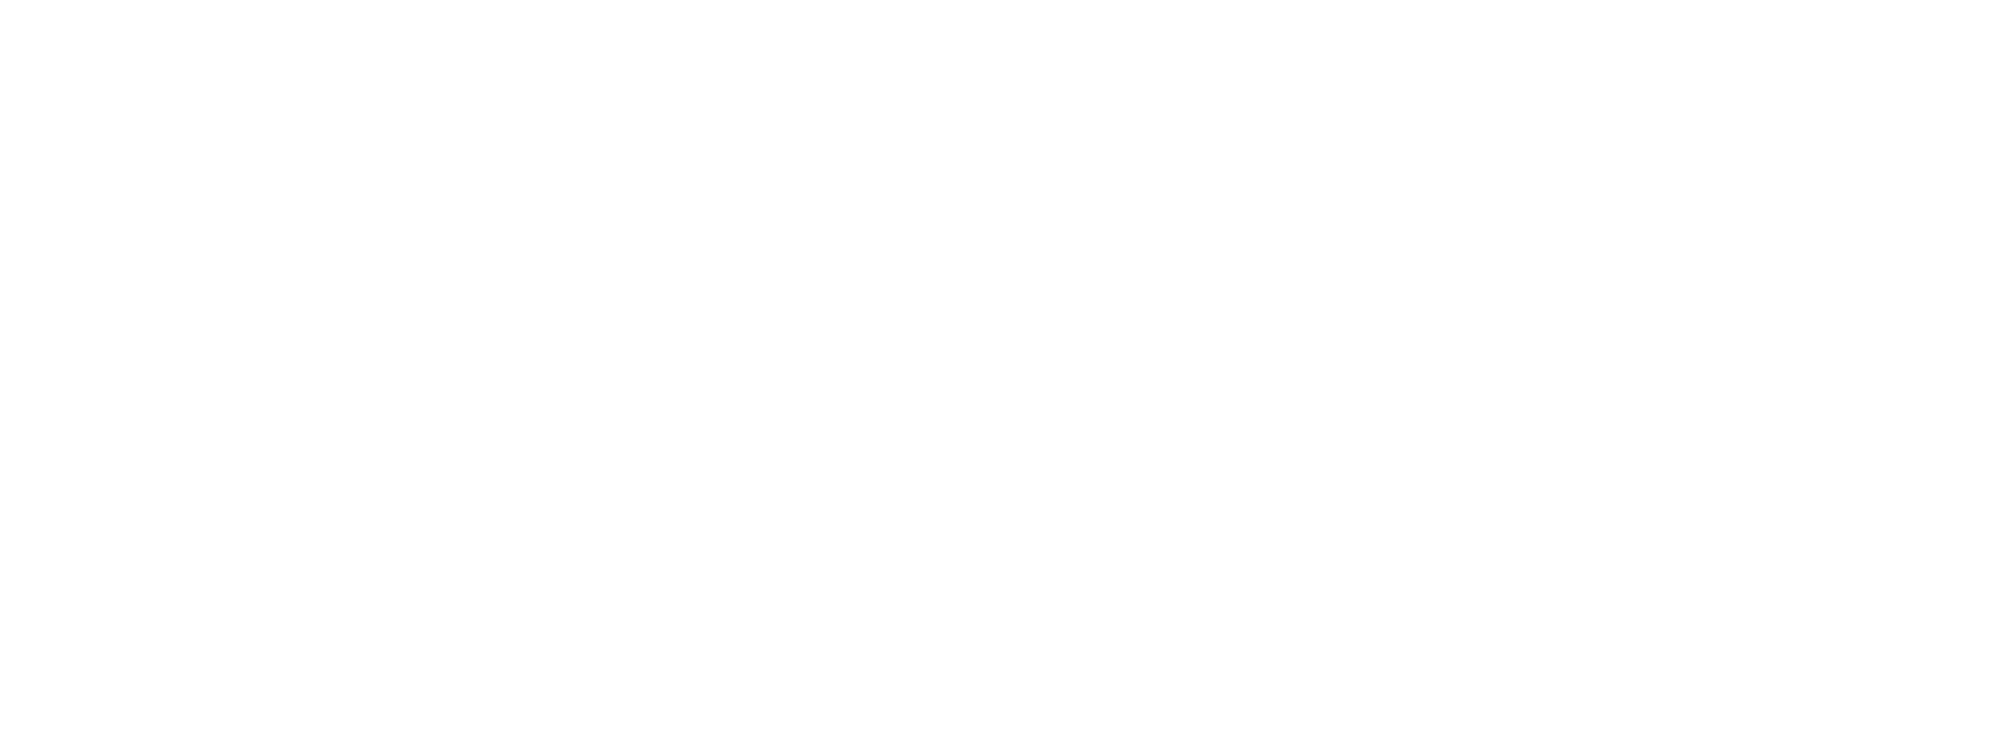 Startupfestival Sponsor - Swapcard